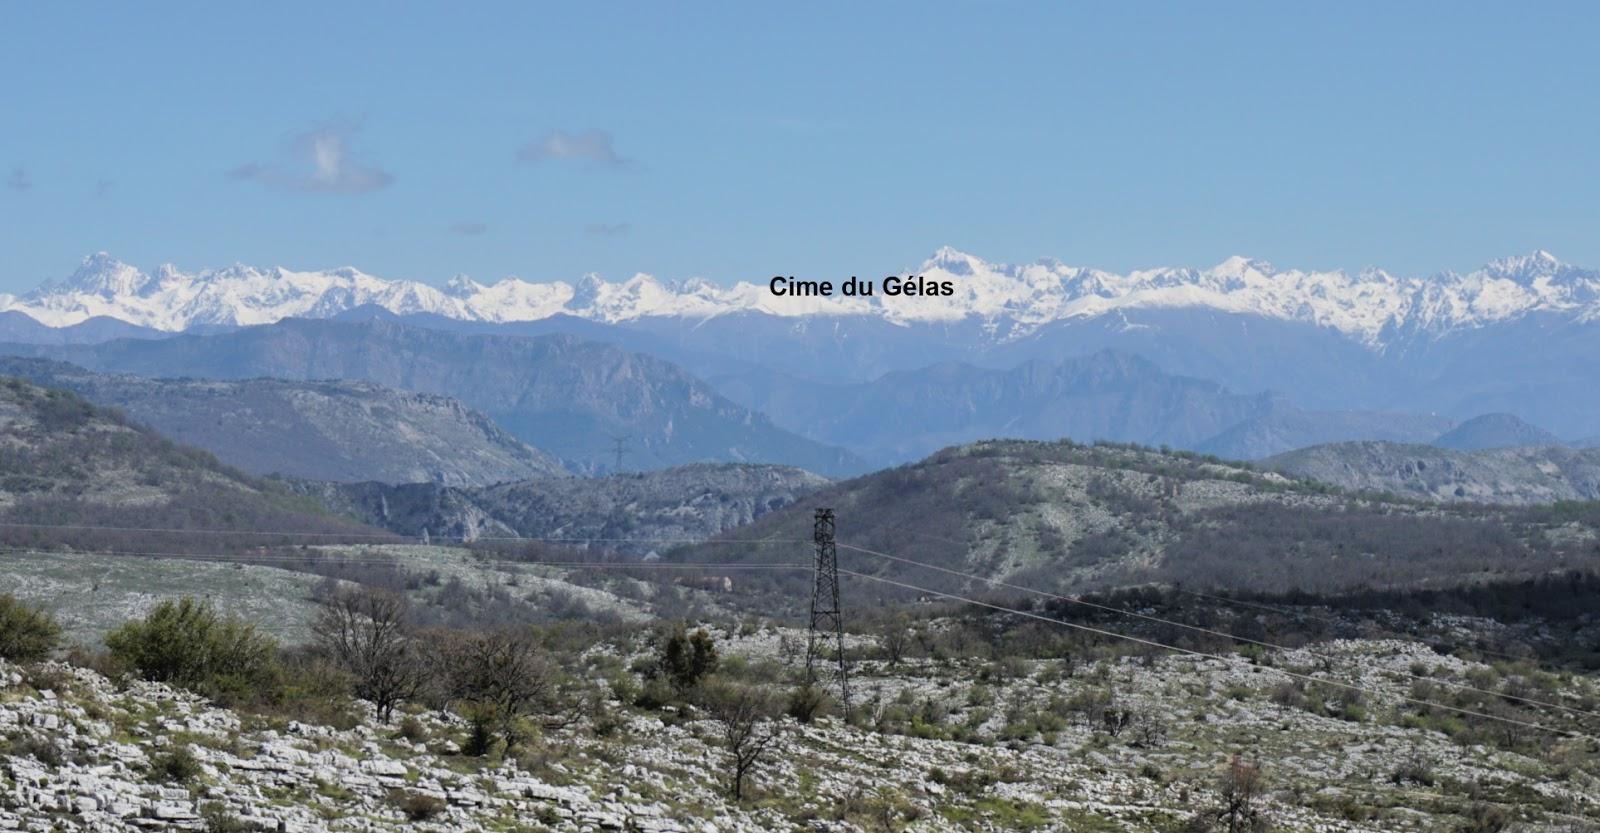 Cime du Gélas and southernmost Alps